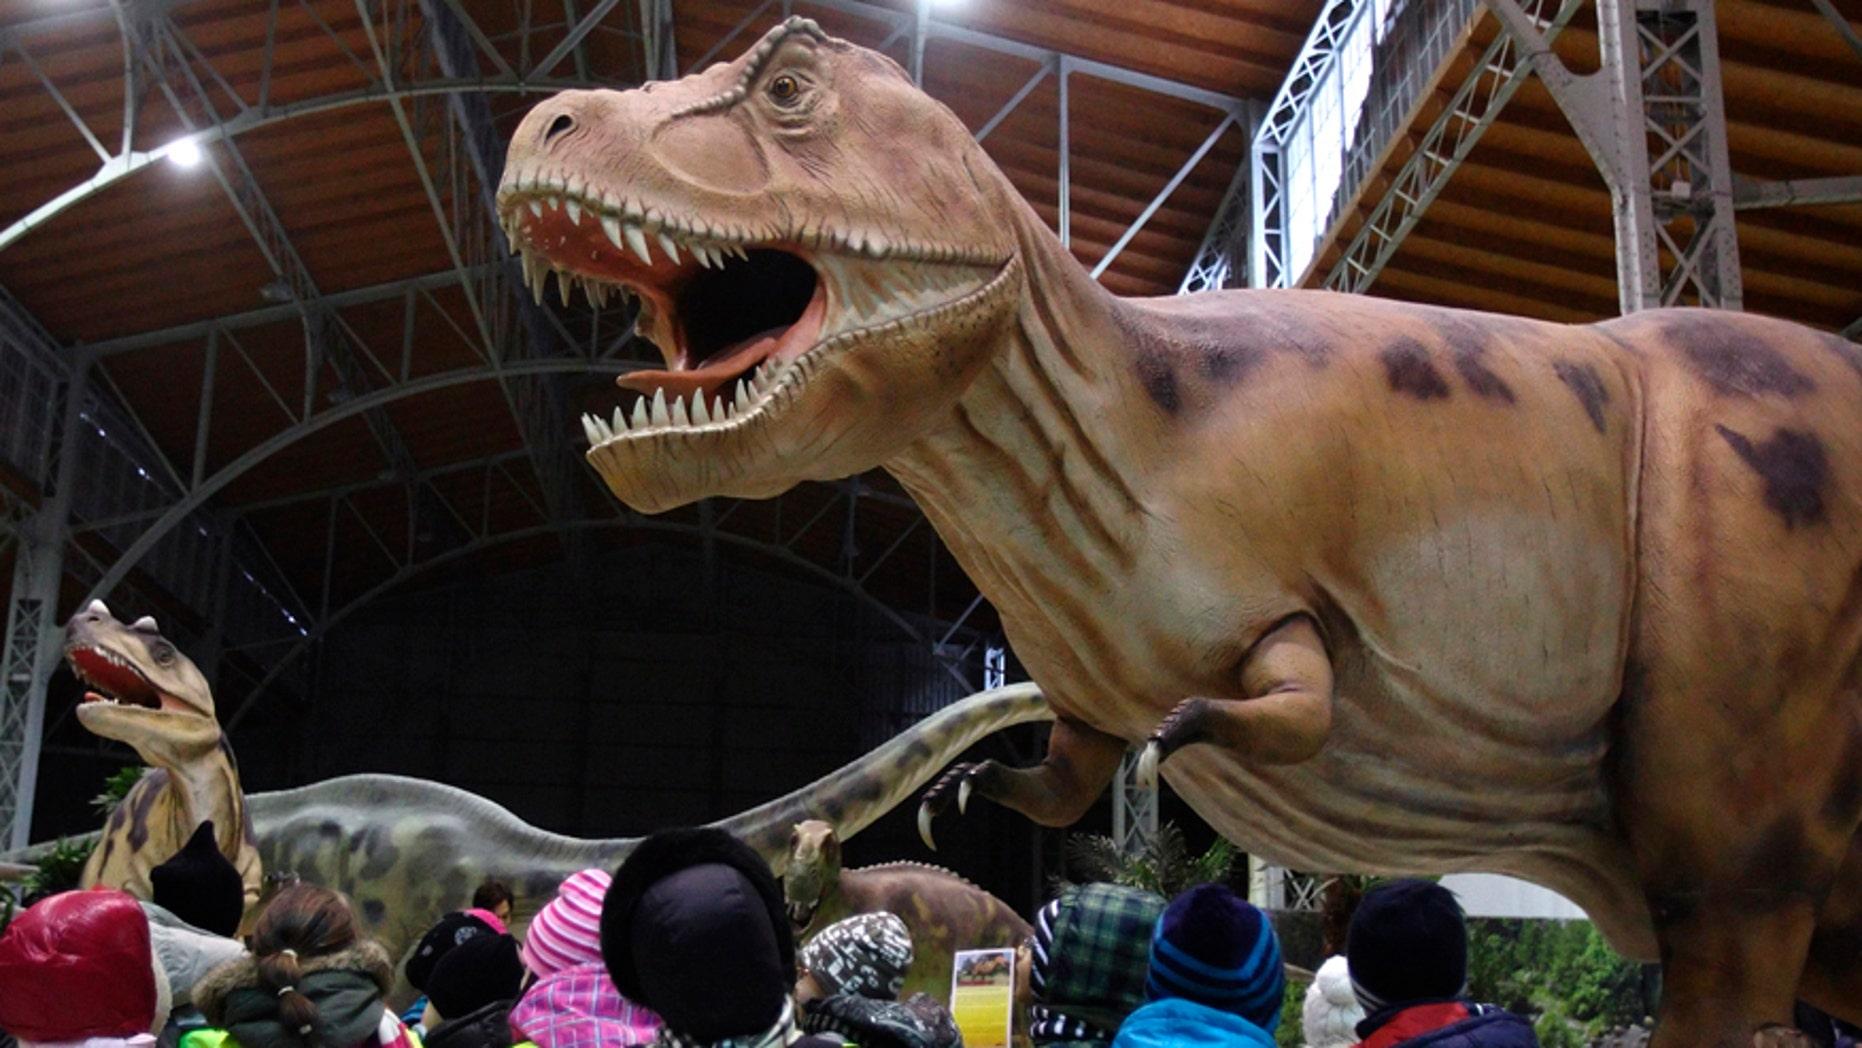 File photo - Children watch a life-sized Tyrannosaurus Rex dinosaur model in Vienna Feb. 7, 2014.